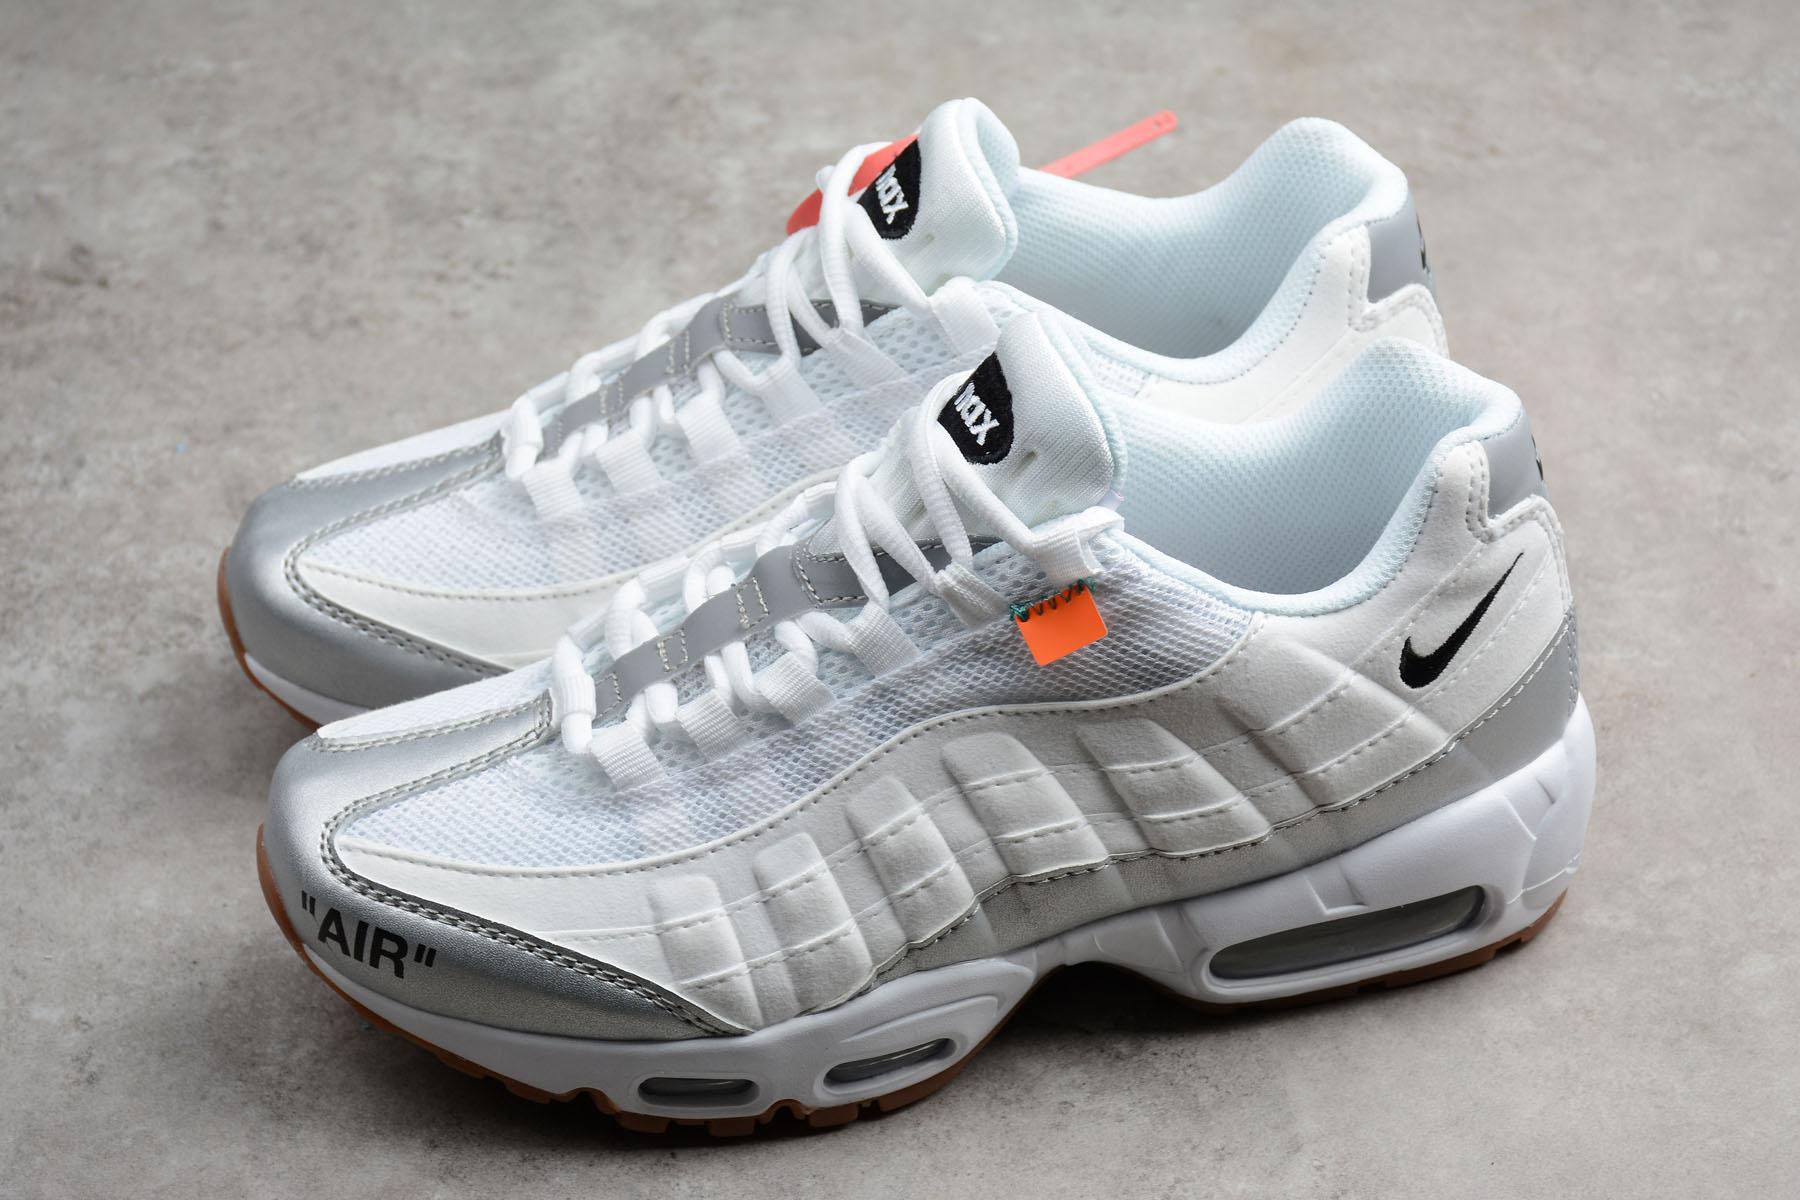 08215c81 Nike Air Max 95 Off-White Silver цены. Купить кроссовки Nike Air Max (Найк  Аир Макс) 95 Киев, Украина.